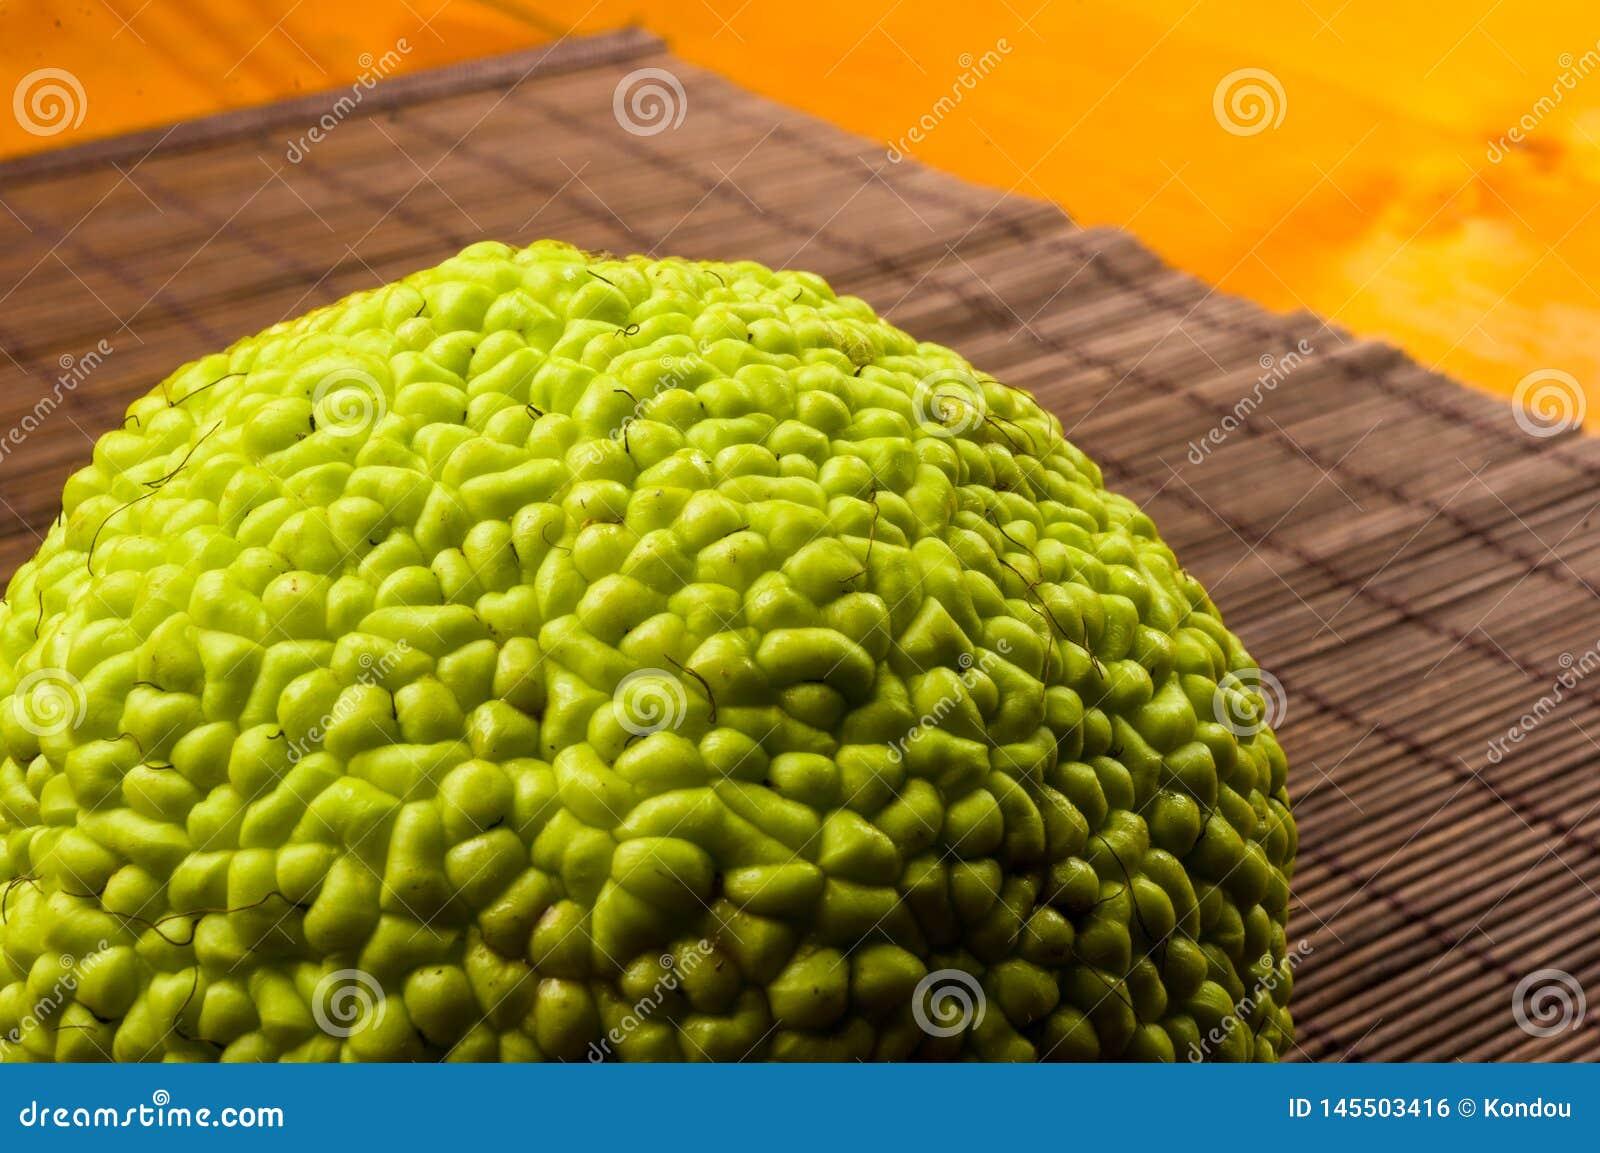 Maclura pomifera,哇洒琪橘,马苹果,喉绿色果子在竹席子增长